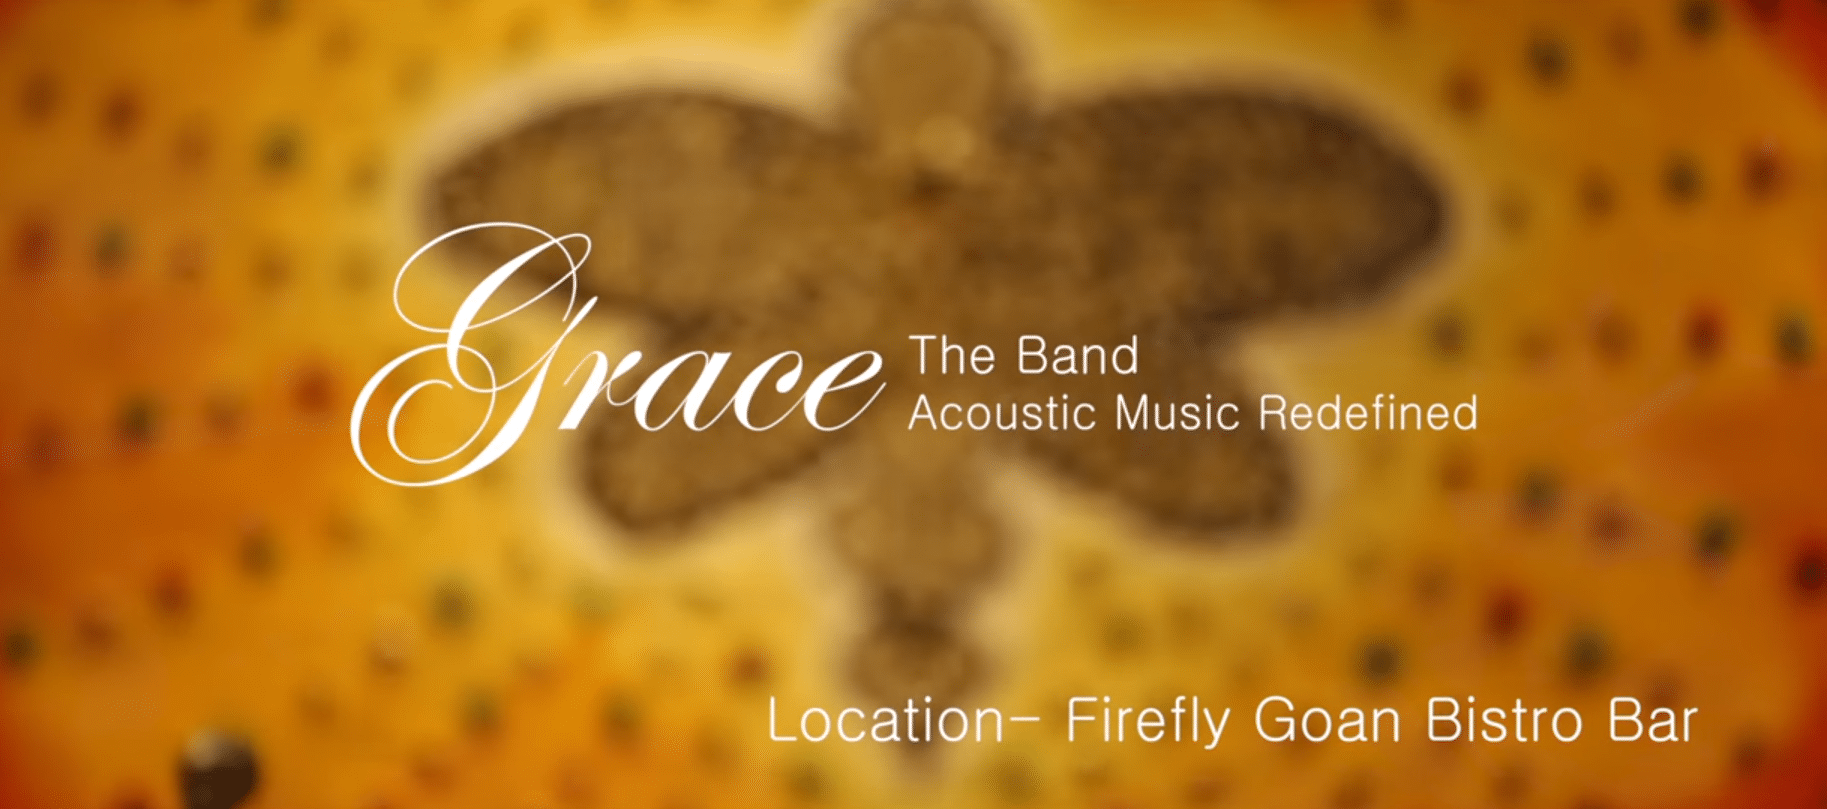 Grace- Live at Firefly